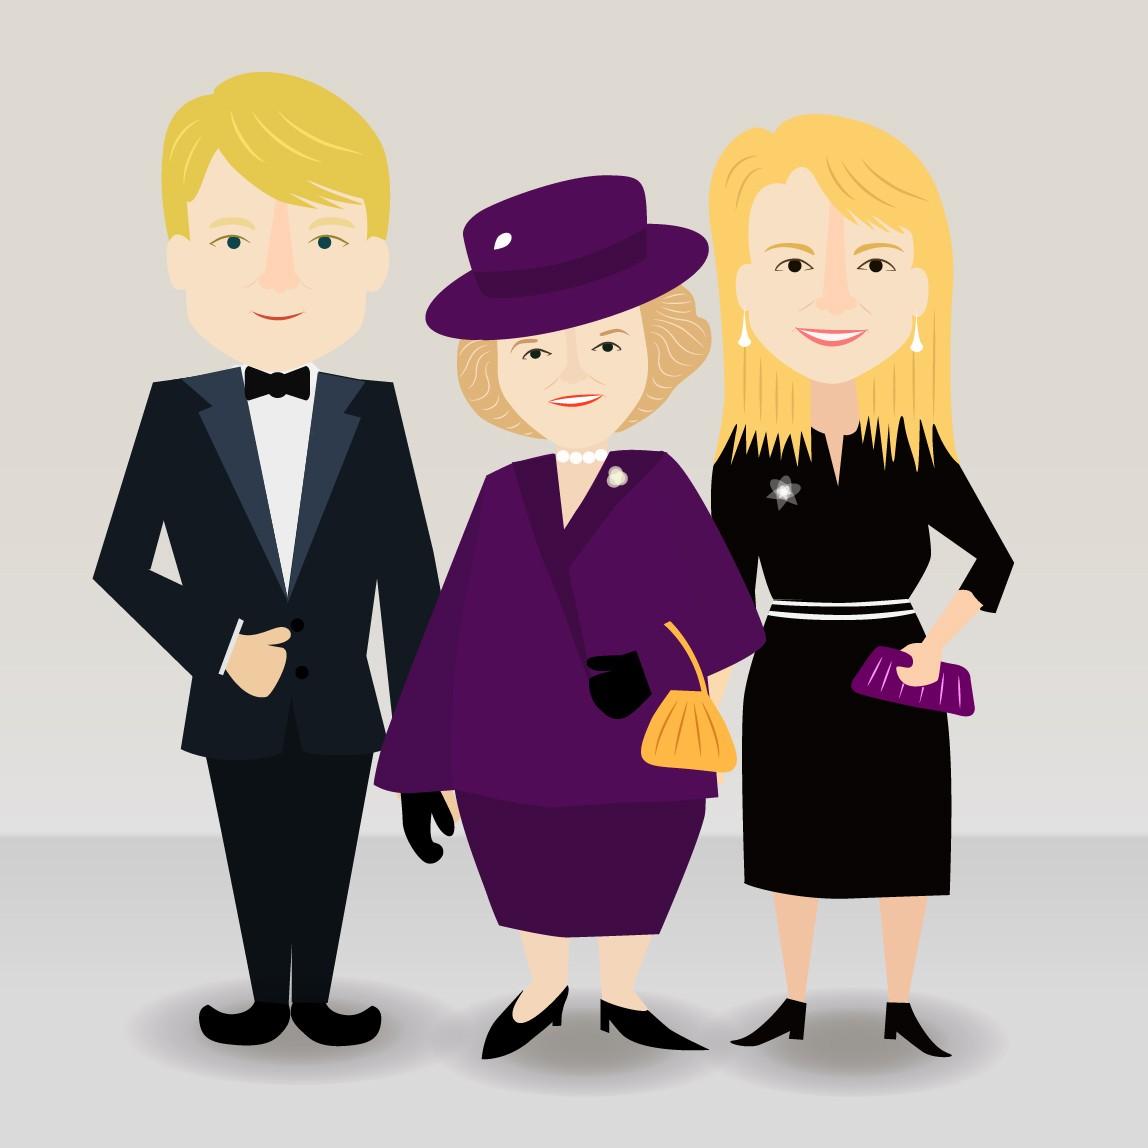 Cartoon characters- Dutch royal family members & politicians